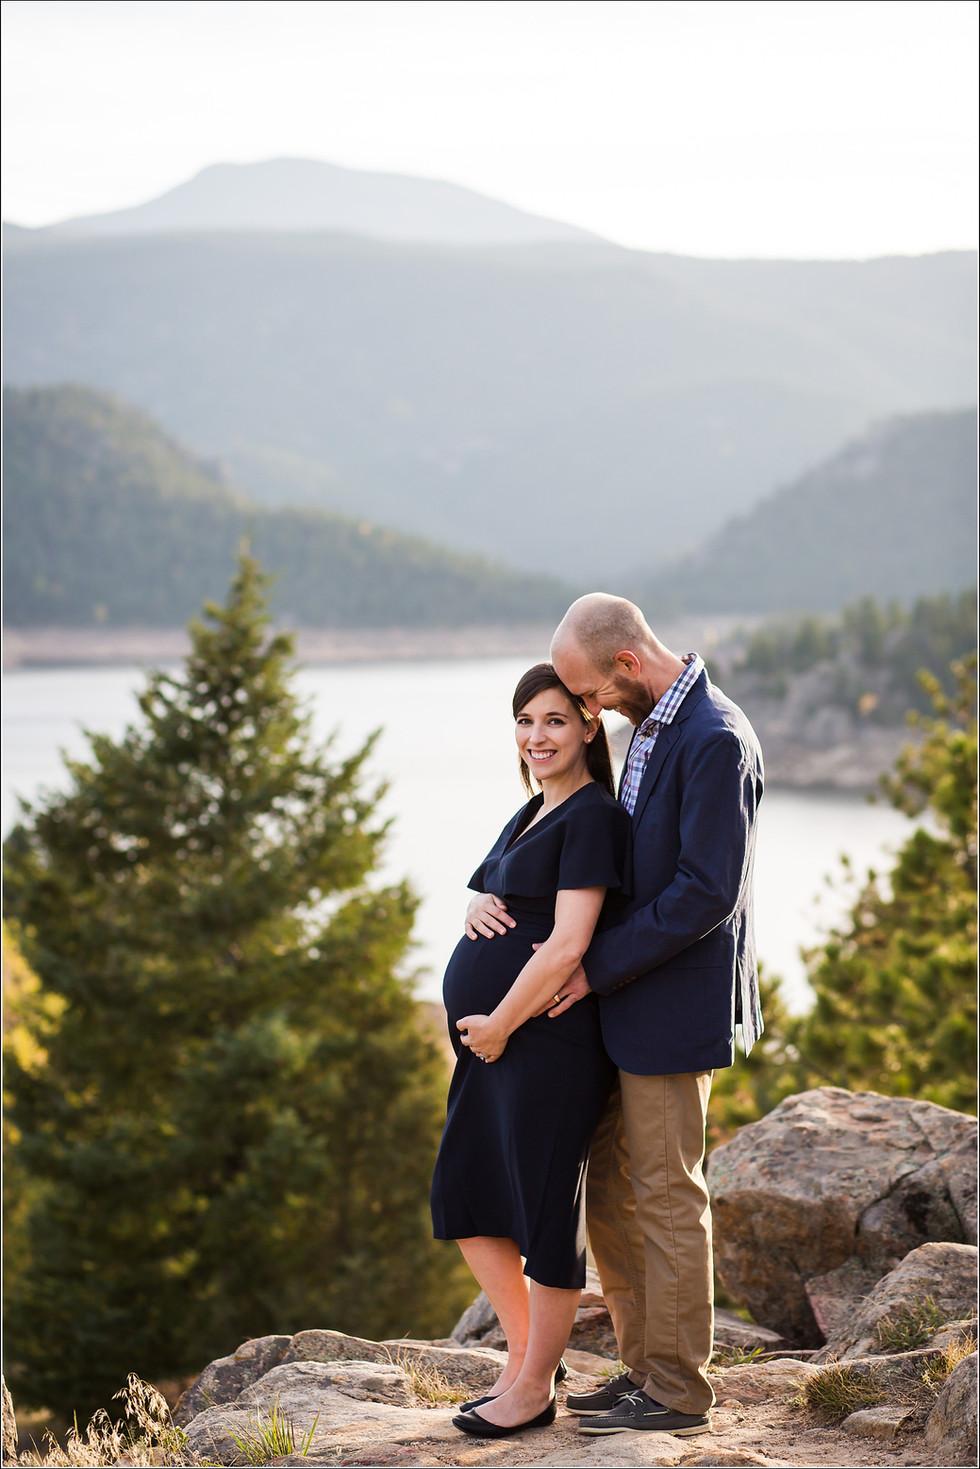 Matt + Stephanie | Pregnancy Photoshoot | Boulder Maternity Photos